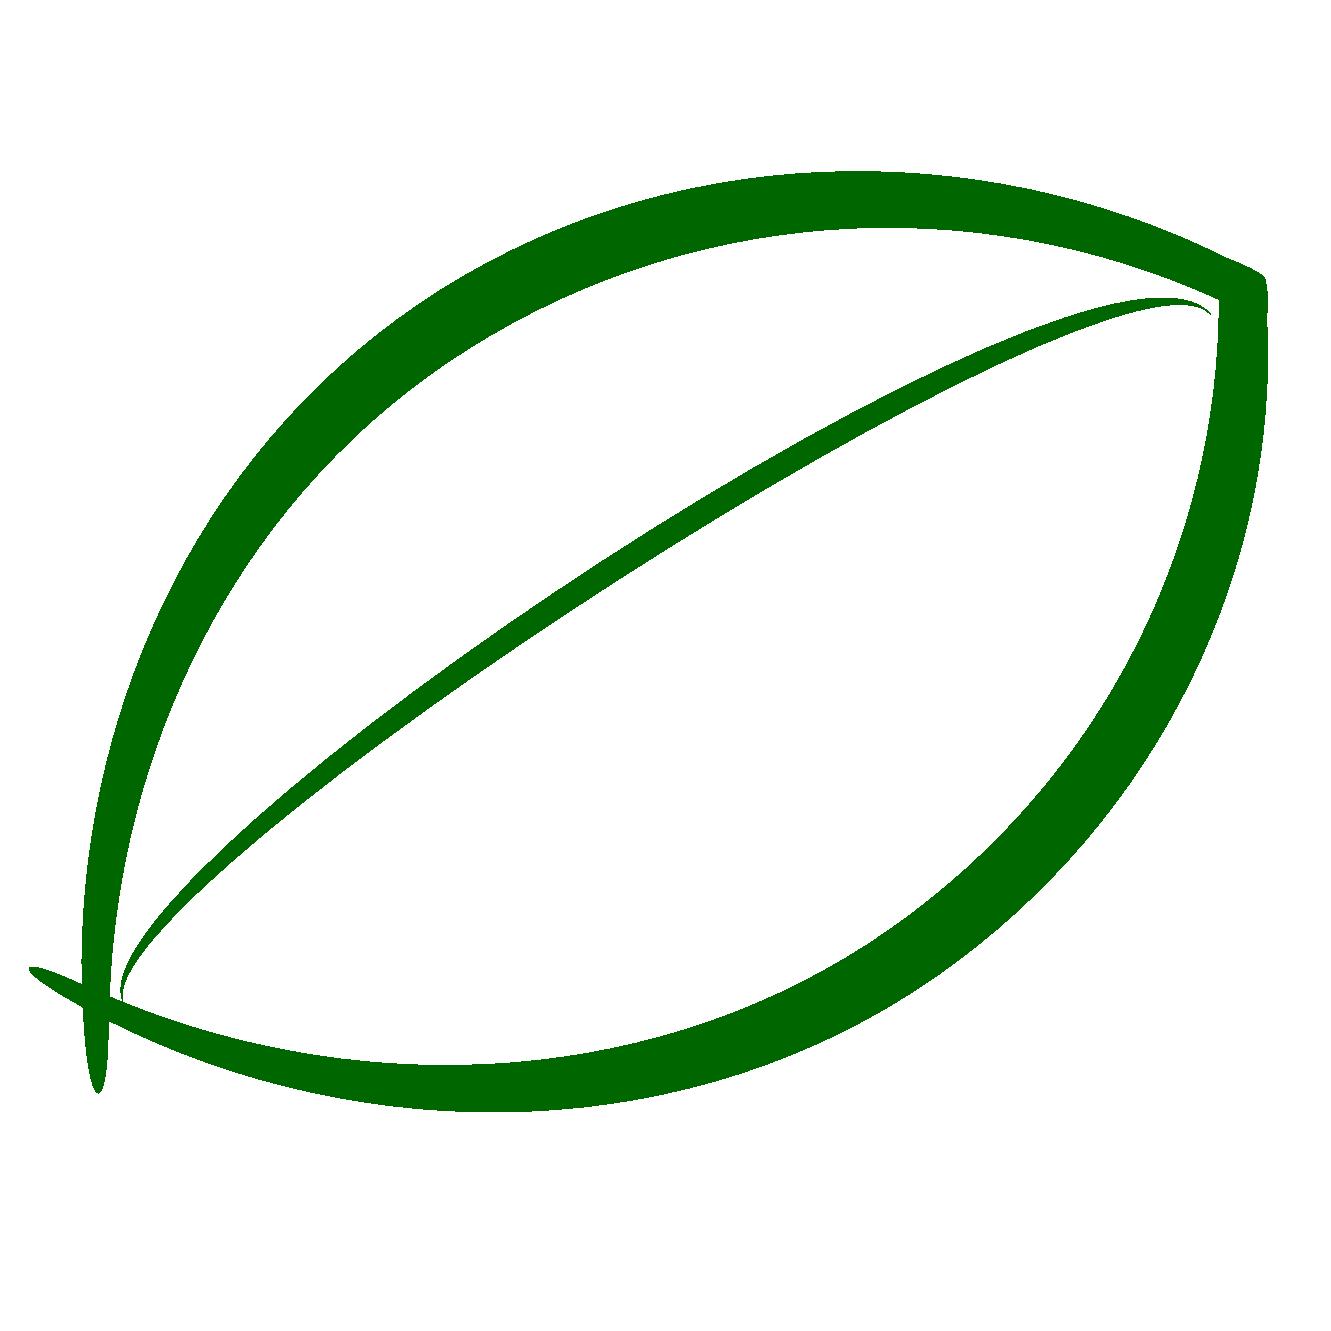 Green Leaf Outline - ClipArt Best